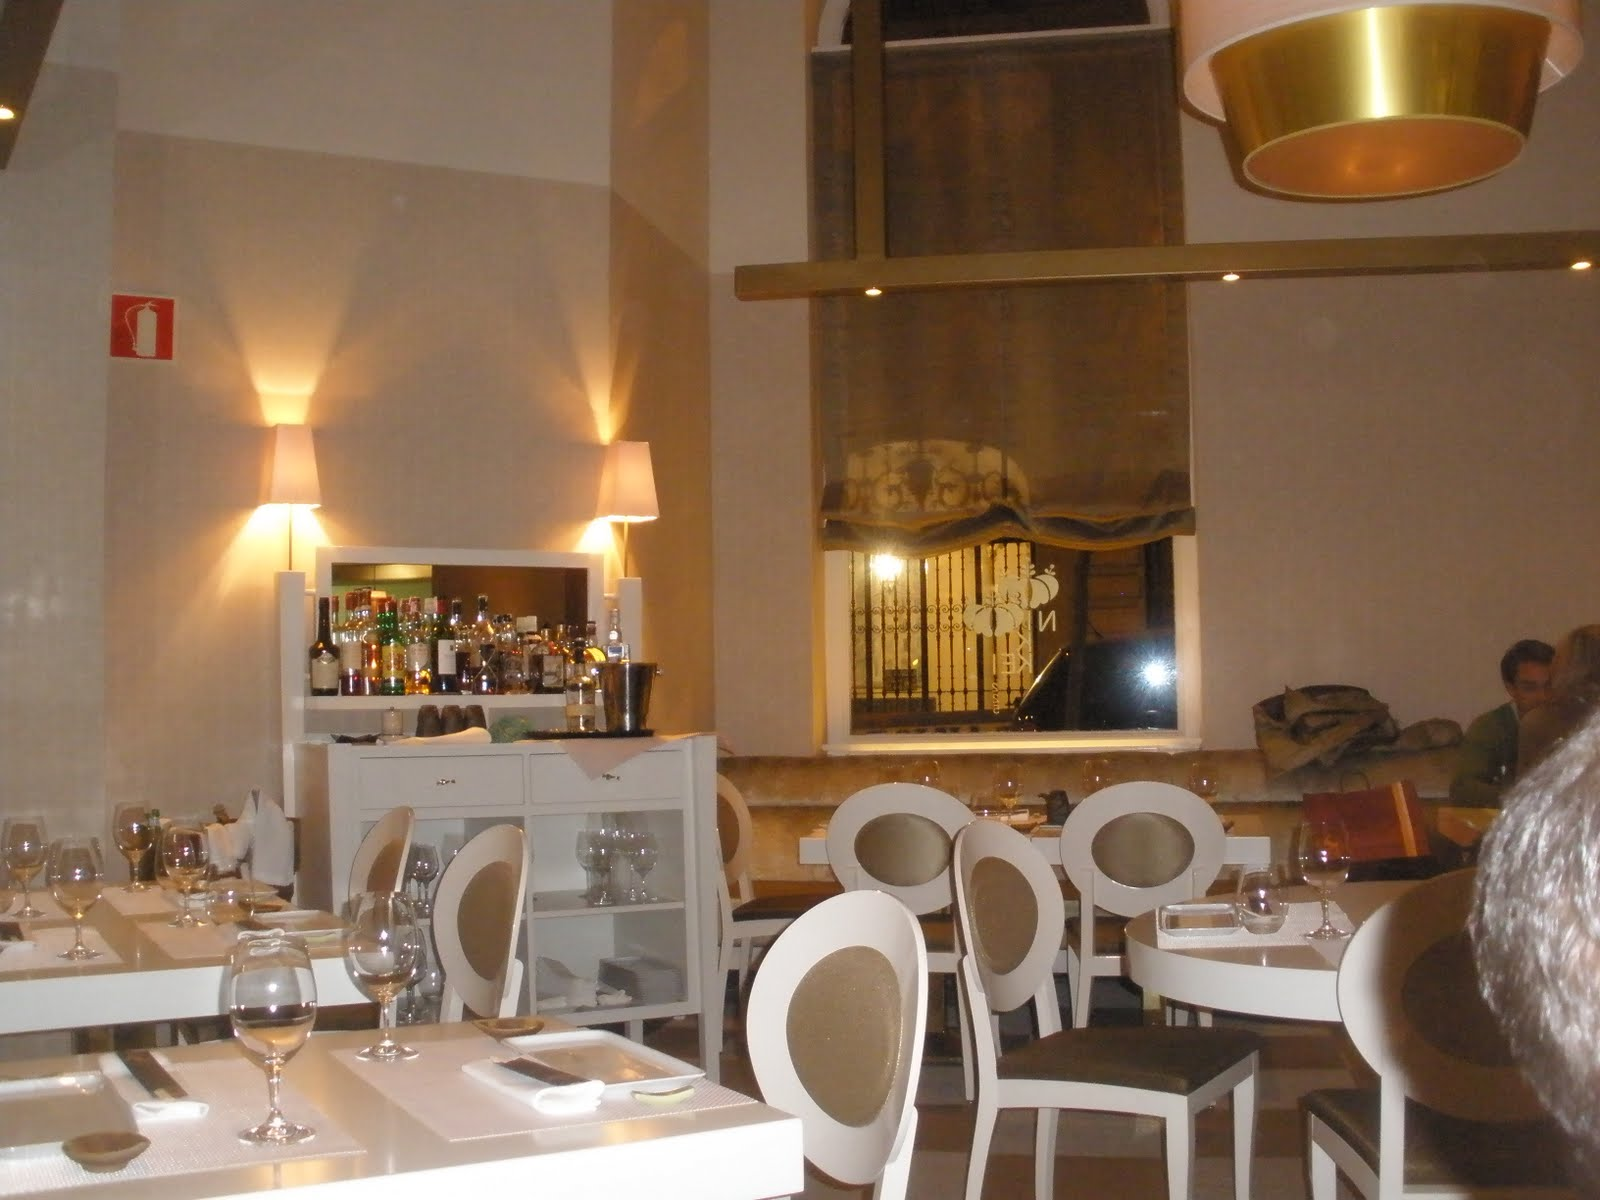 Observaci n gastron mica nikkei 225 madrid - Nikkei 225 restaurante ...